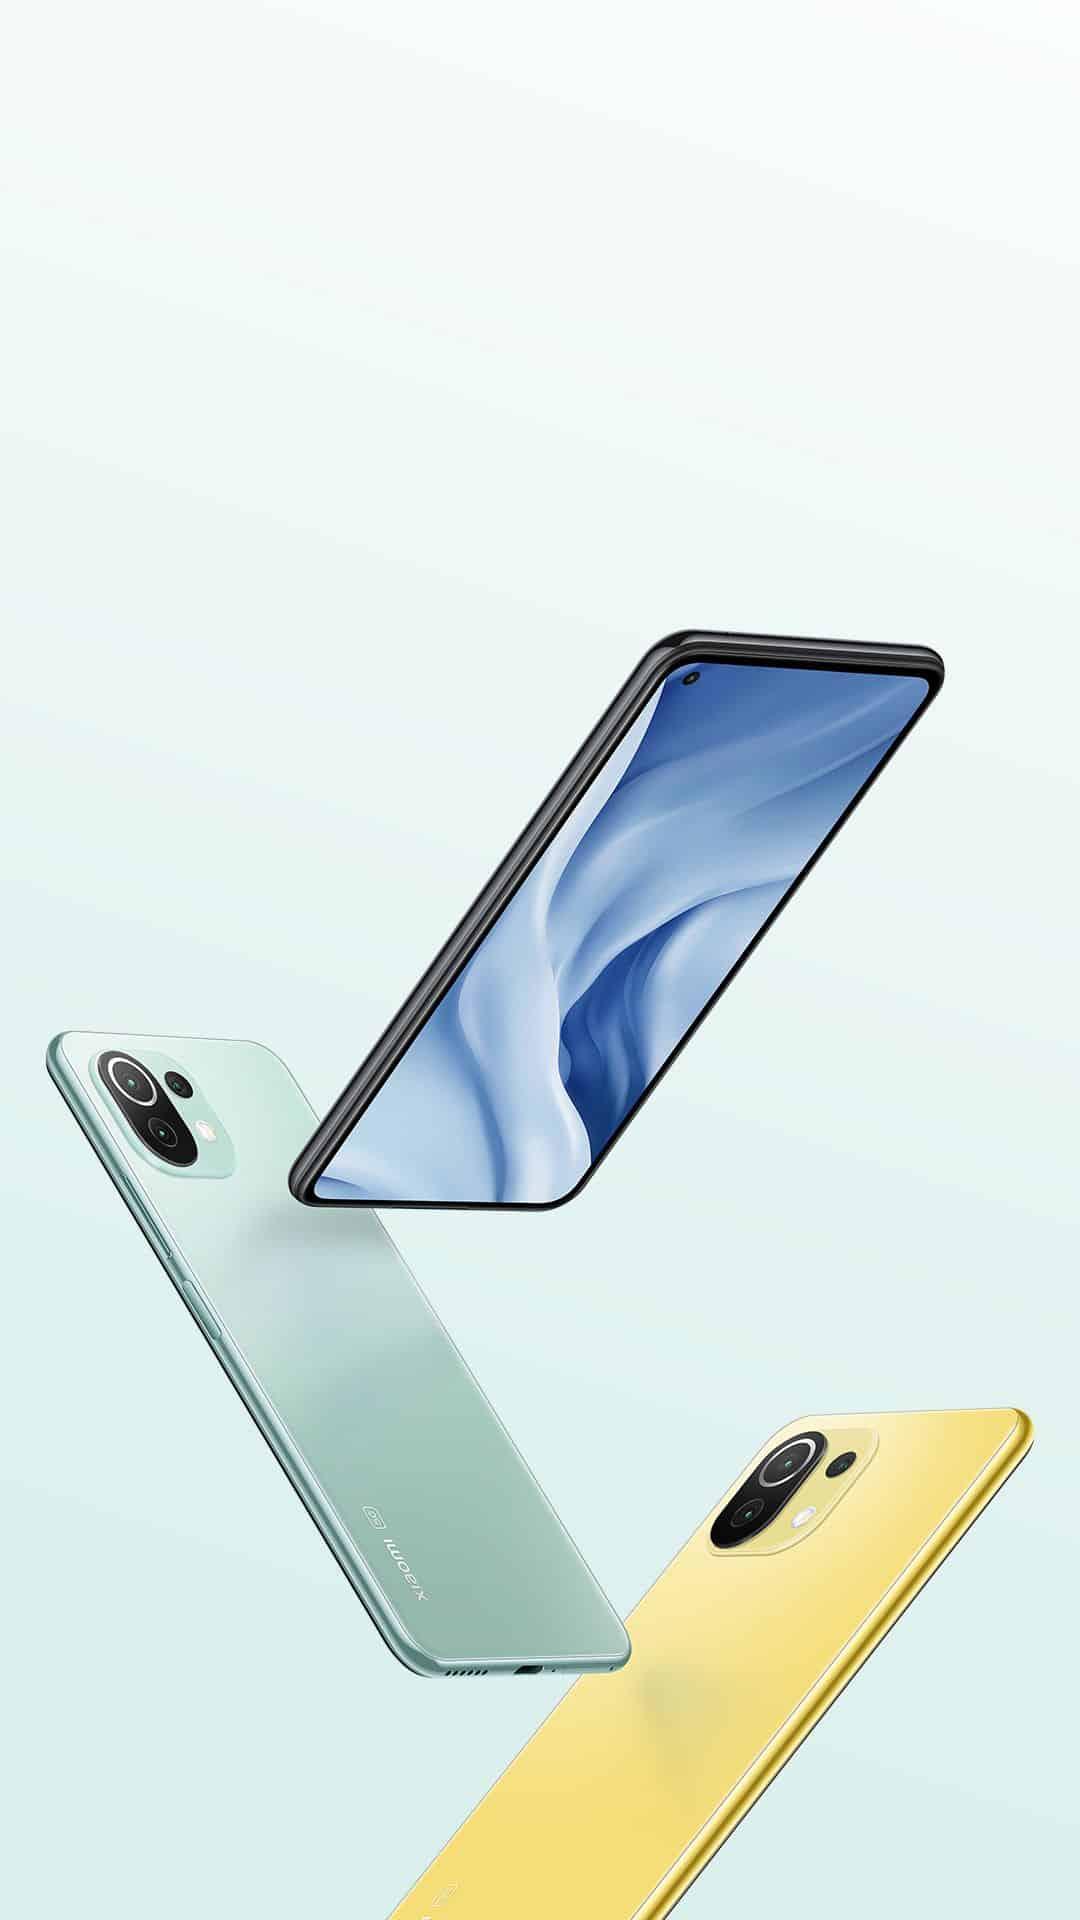 Xiaomi Mi 11 Lite image 1